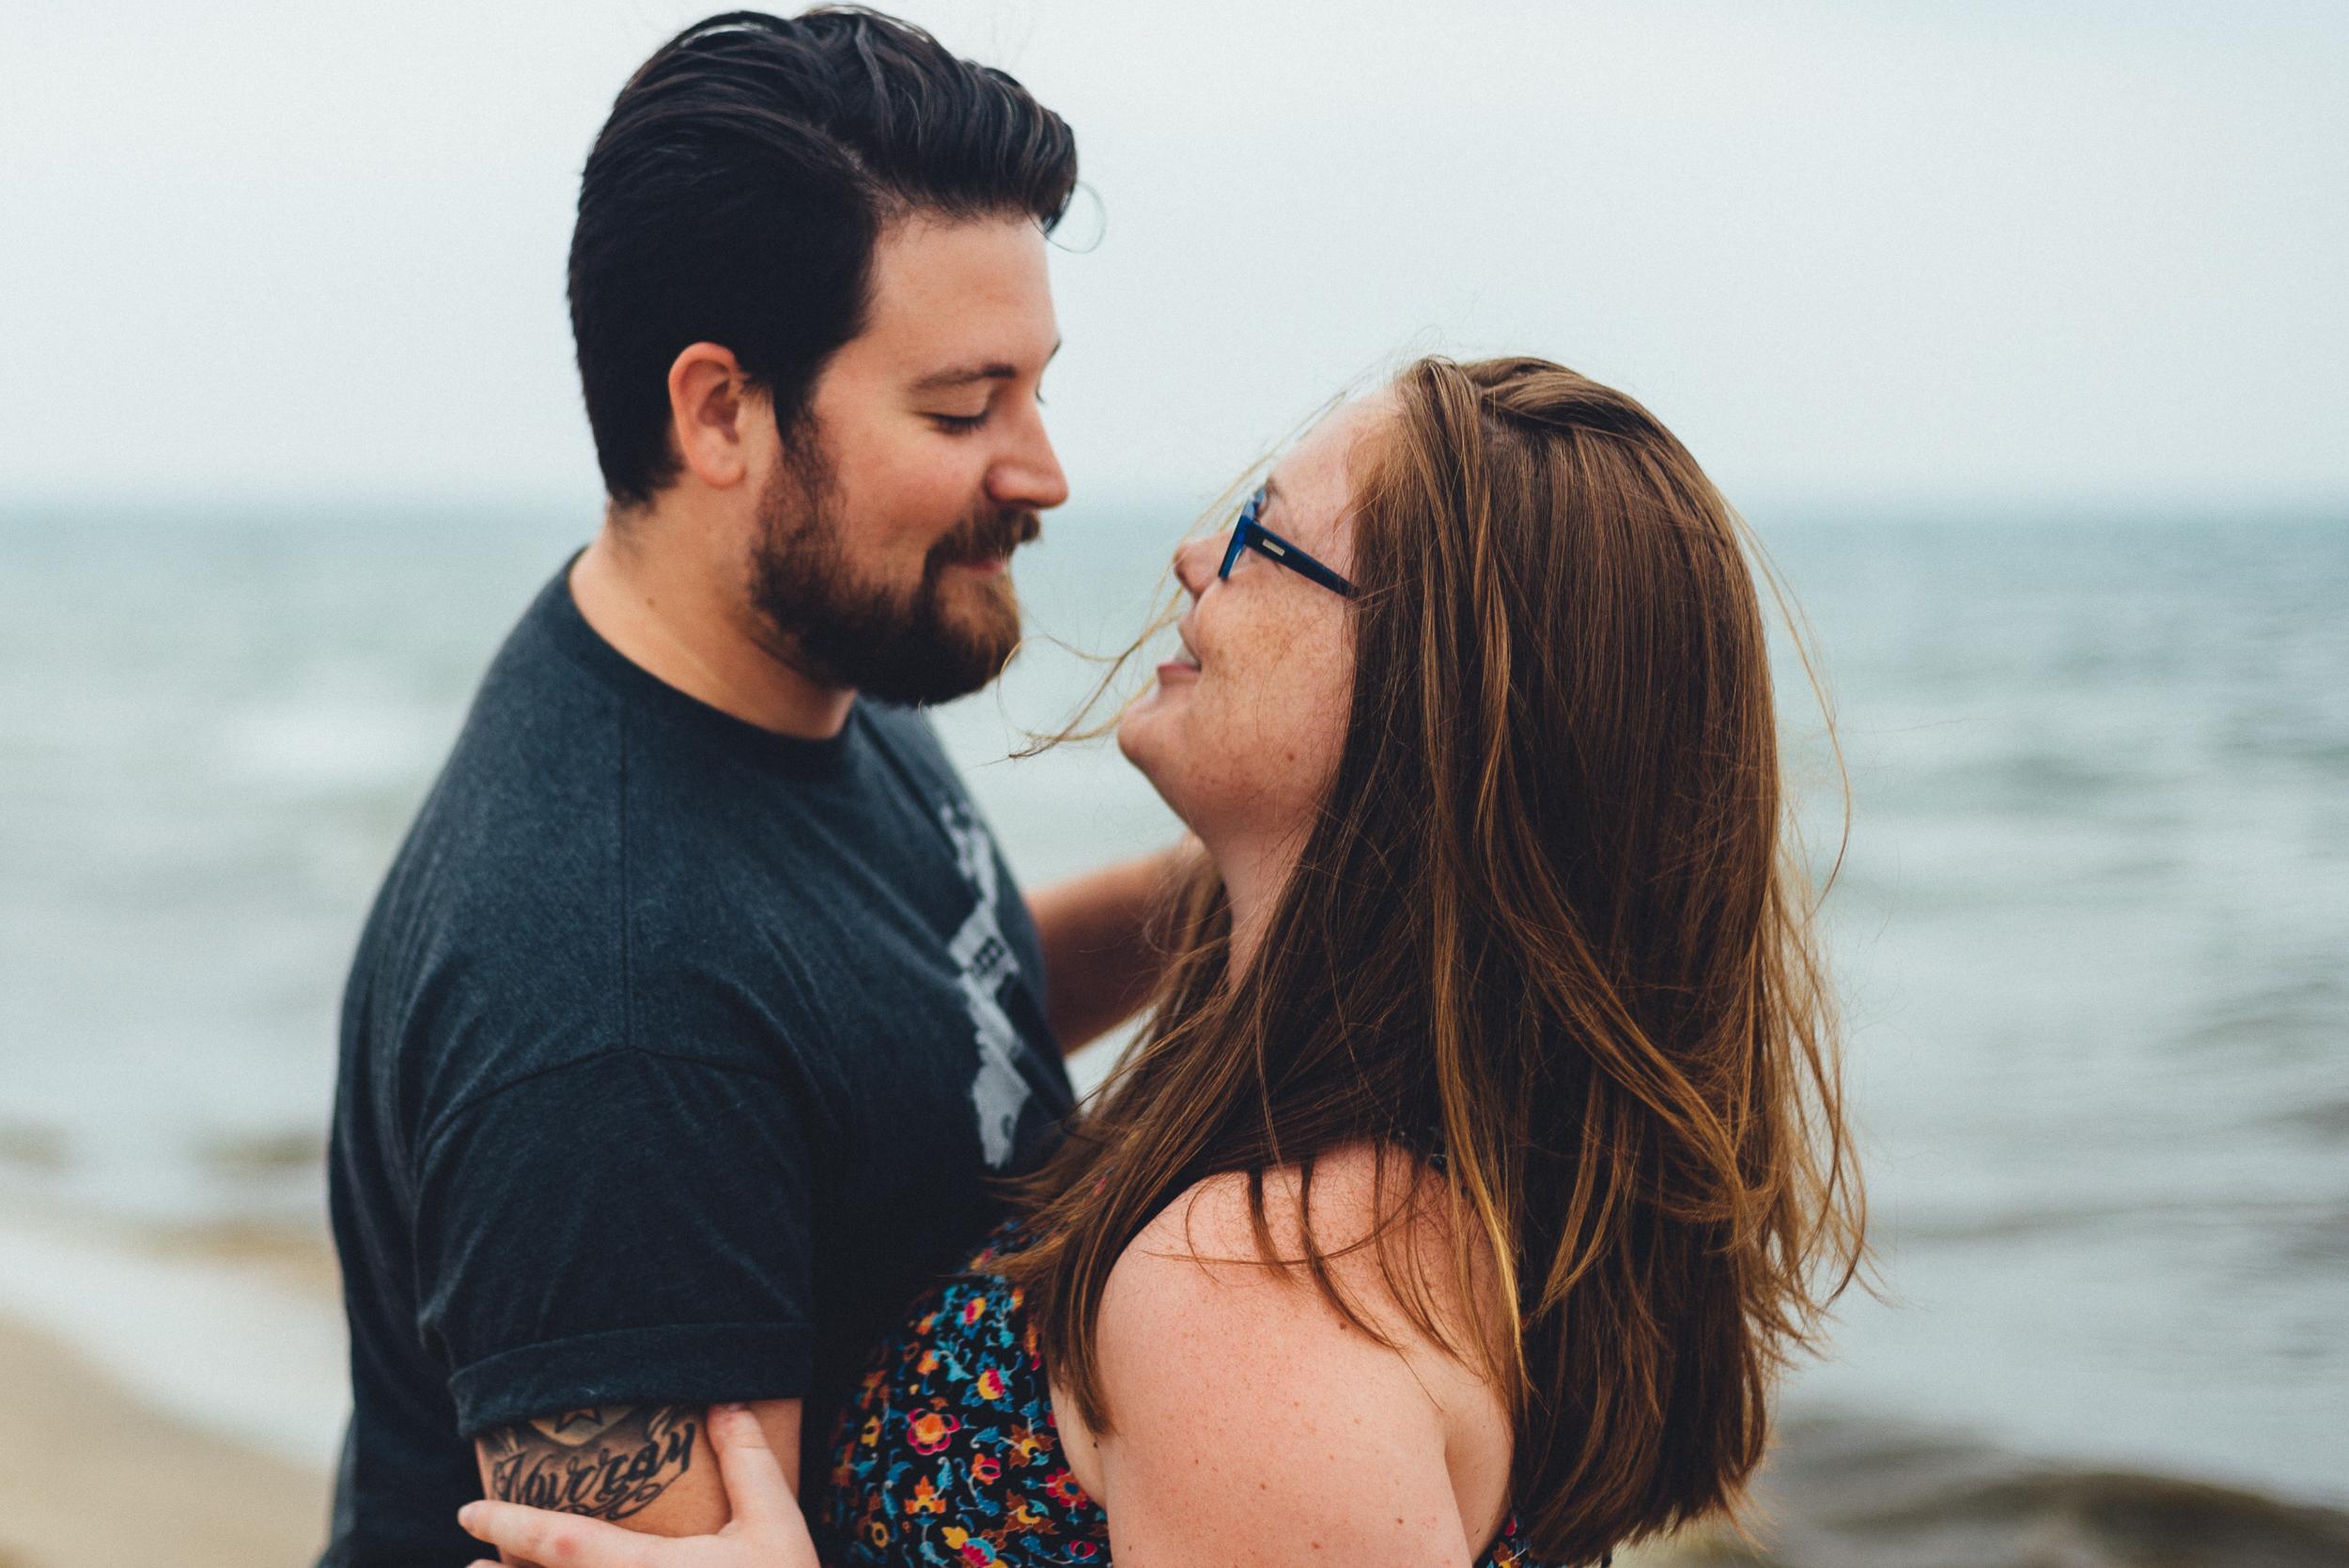 beach_couple_photography_engagment_love_long_island_photographer-18.jpg